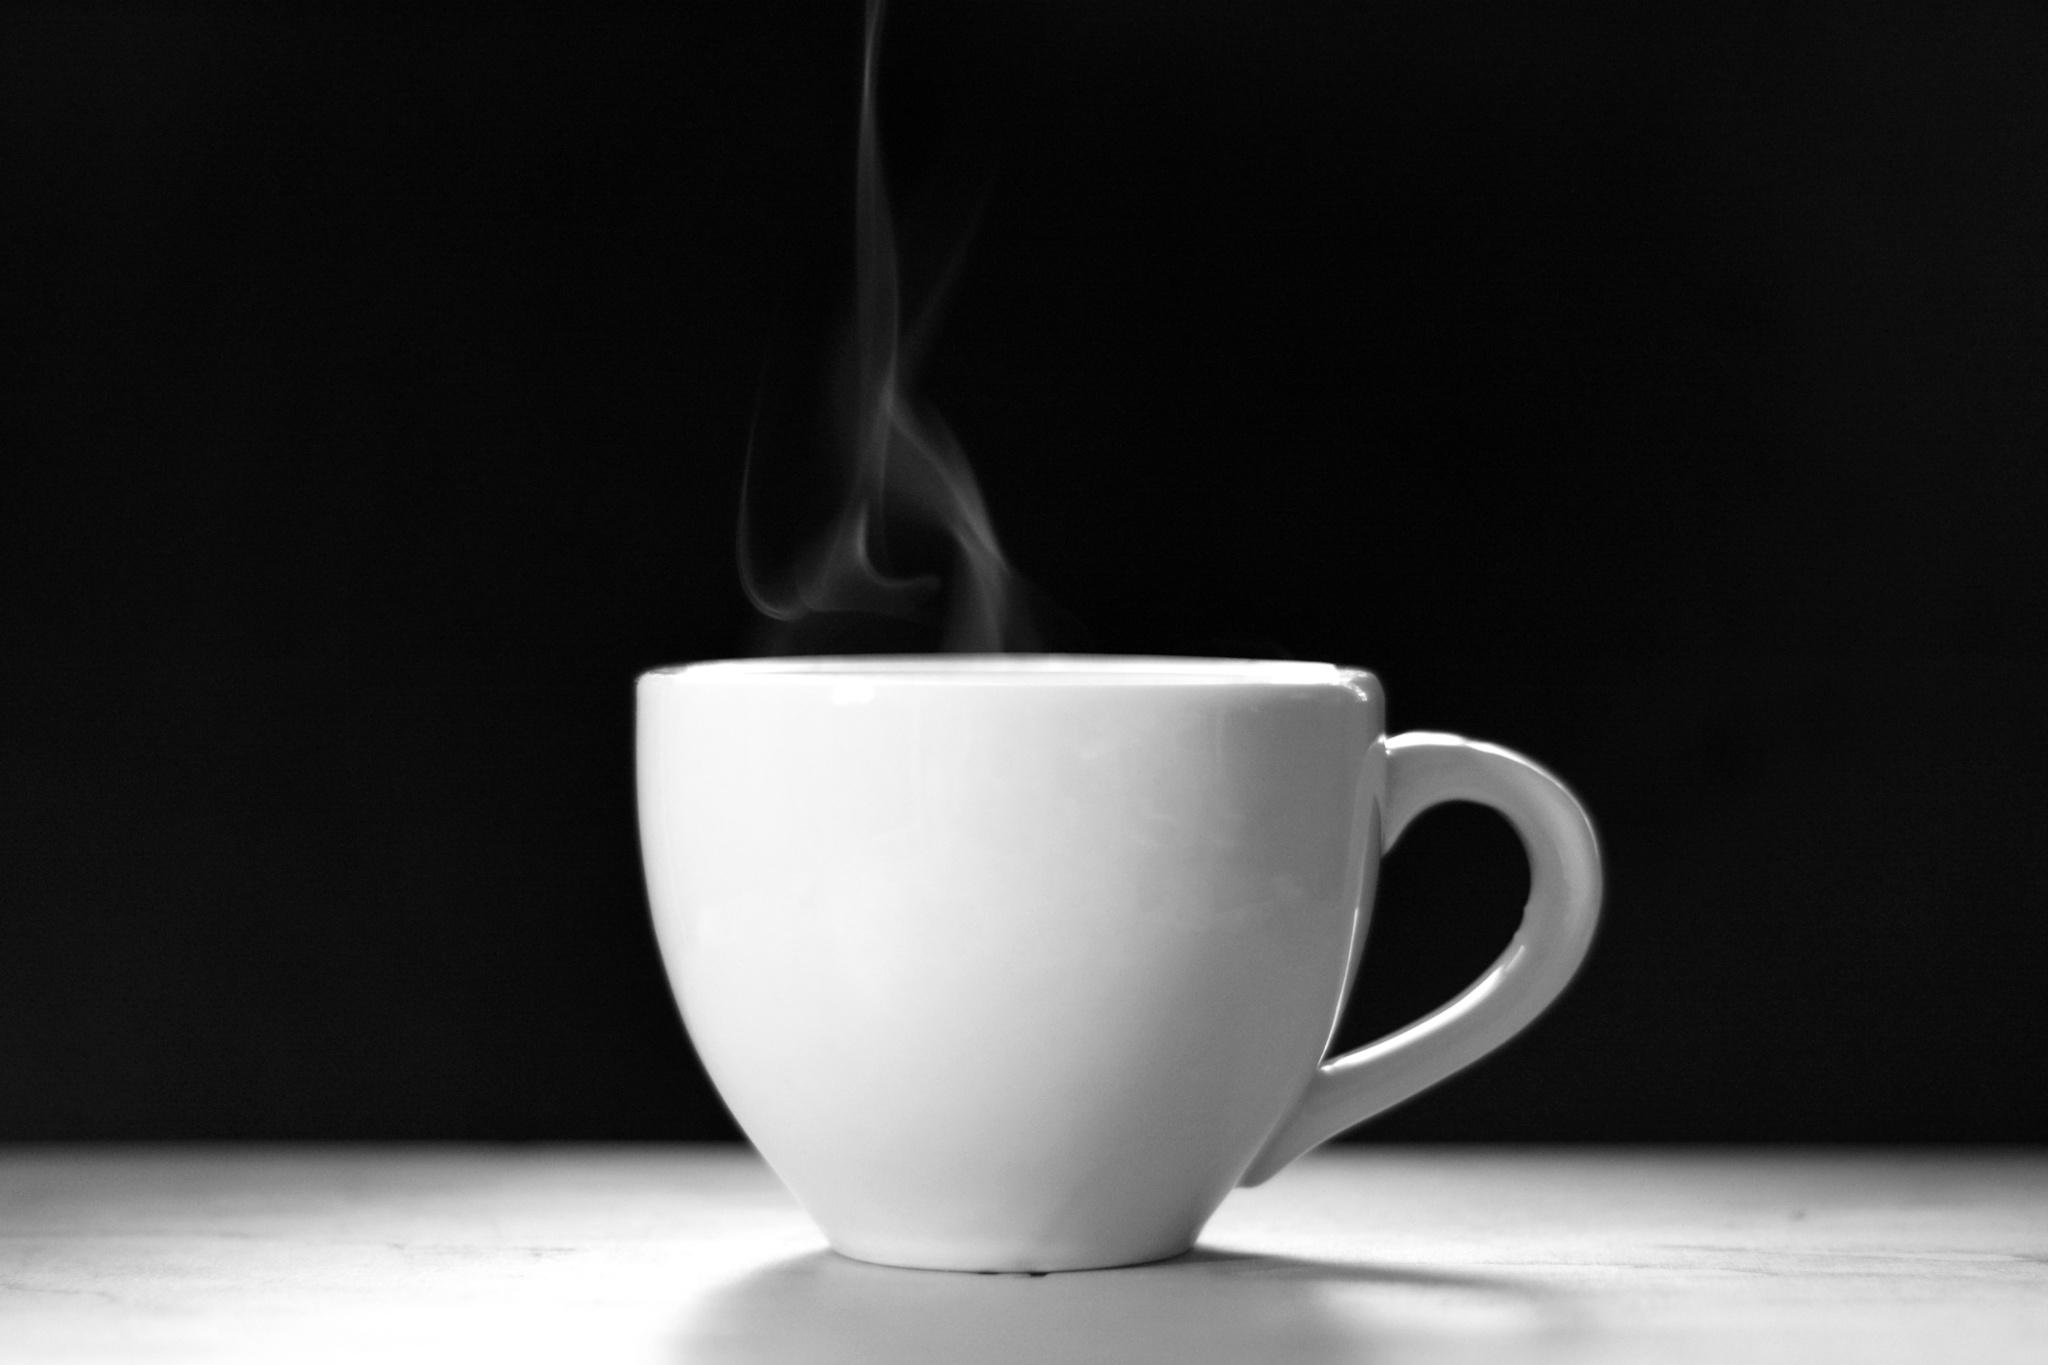 Coffee Steam by karmel